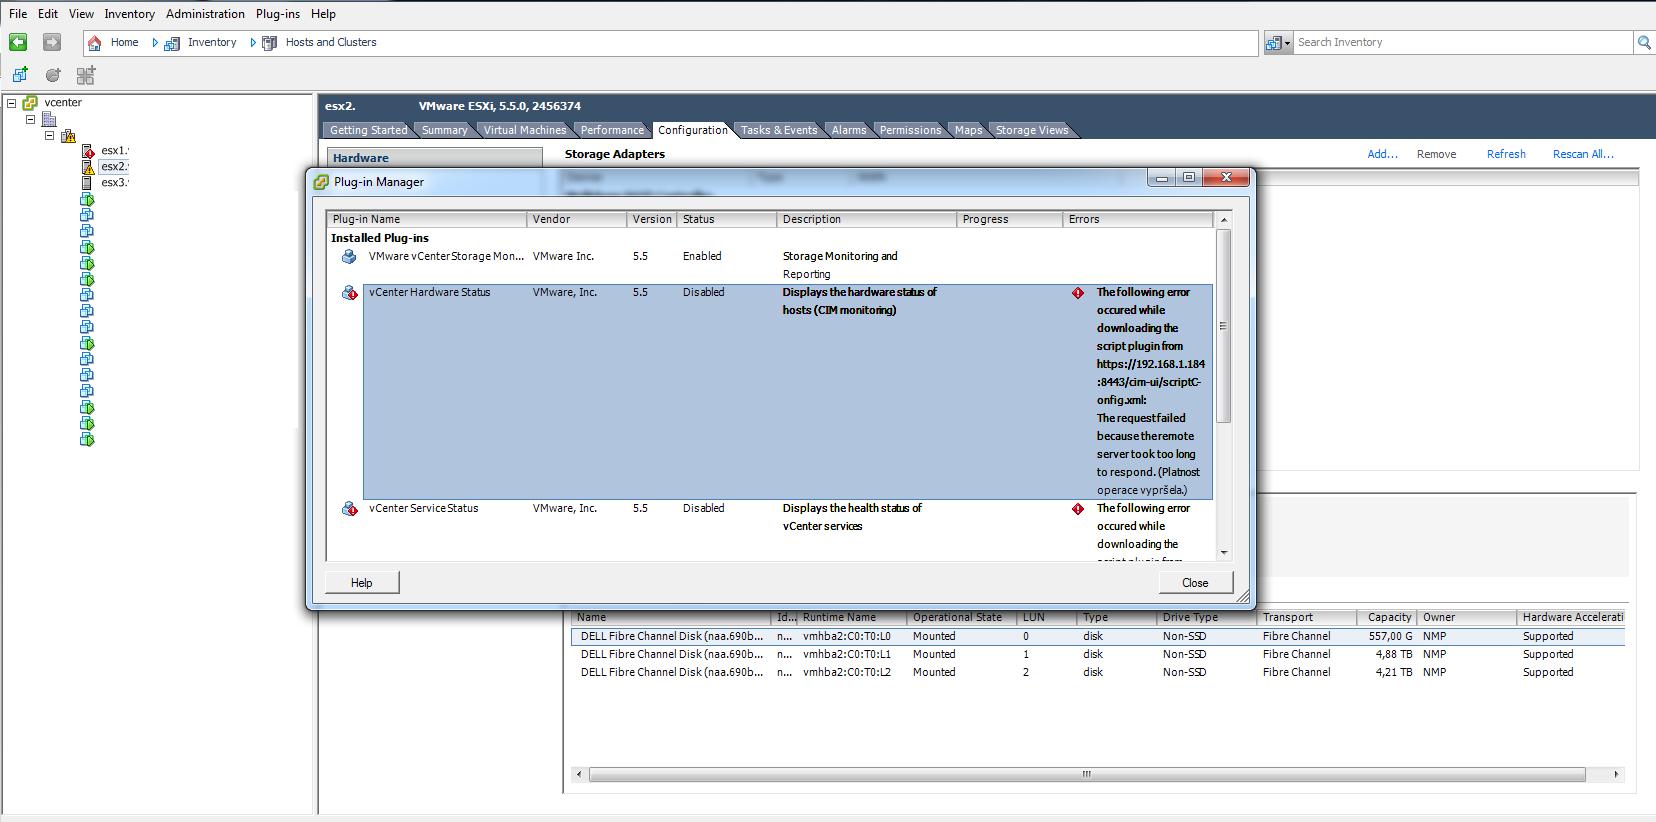 Vcenter Server Appliance Hardware Status Tab Is Missing